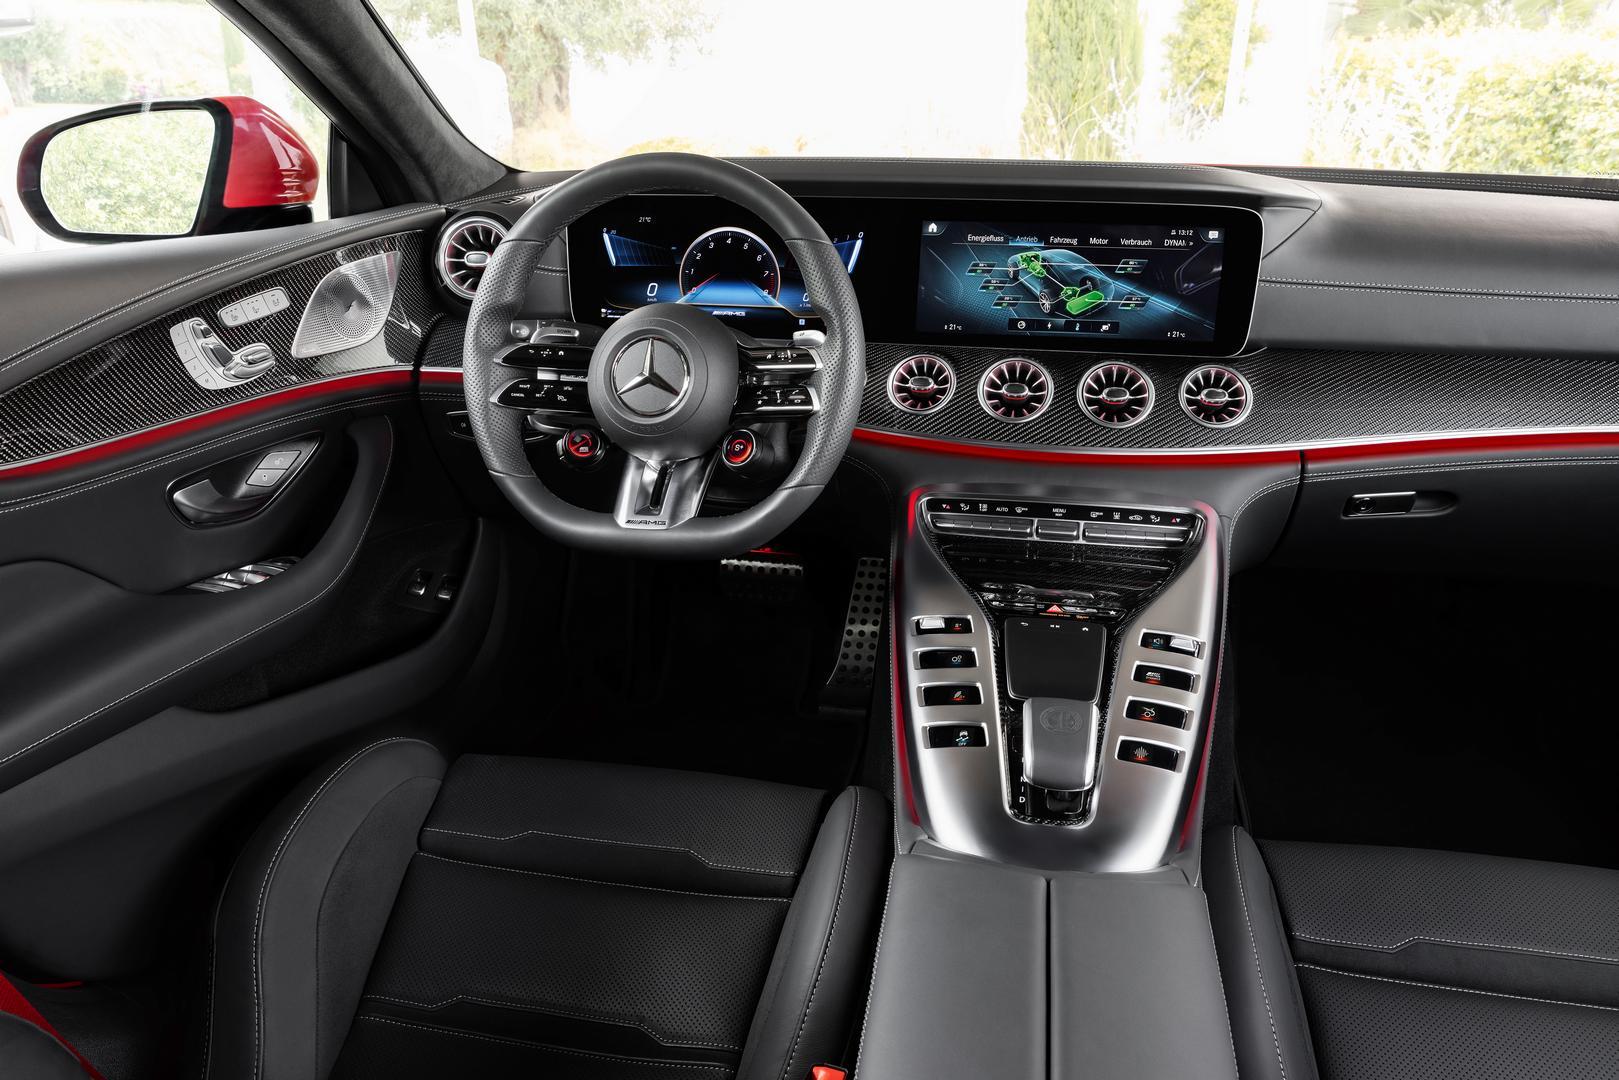 2022 Mercedes-AMG GT 63 S E PERFORMANCE (4MATIC+), 2021Mercedes-AMG GT 63 S E PERFORMANCE interior